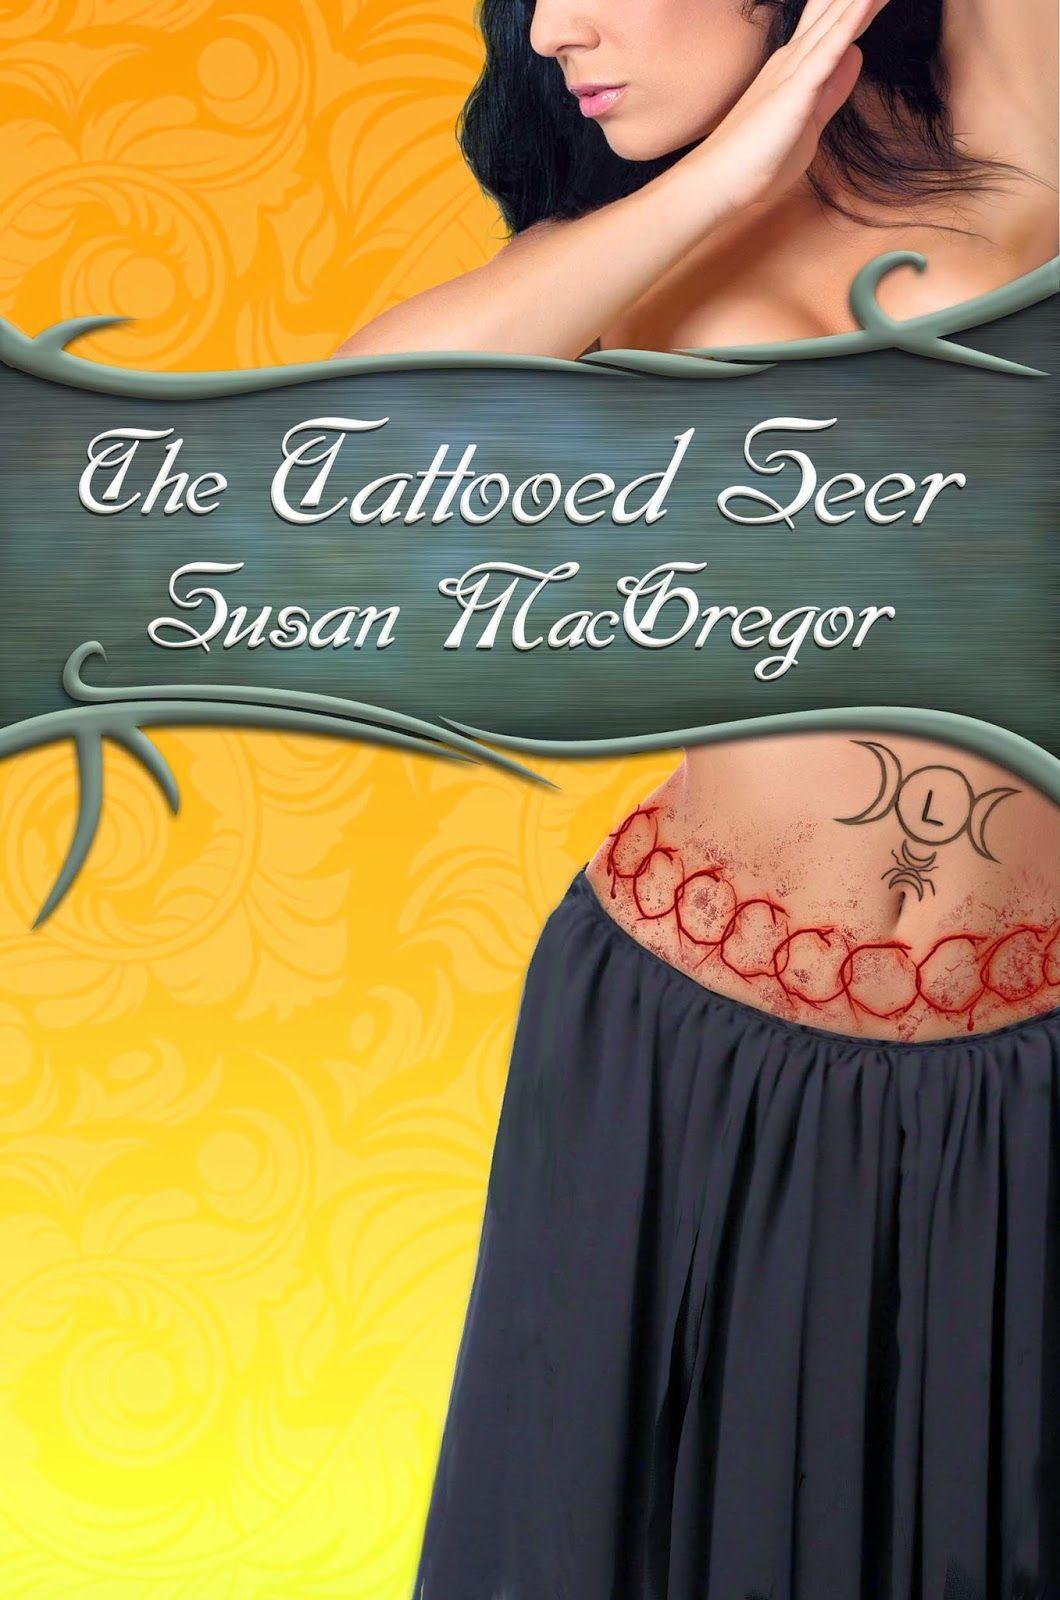 The Tattooed Seer, by Susan MacGregor